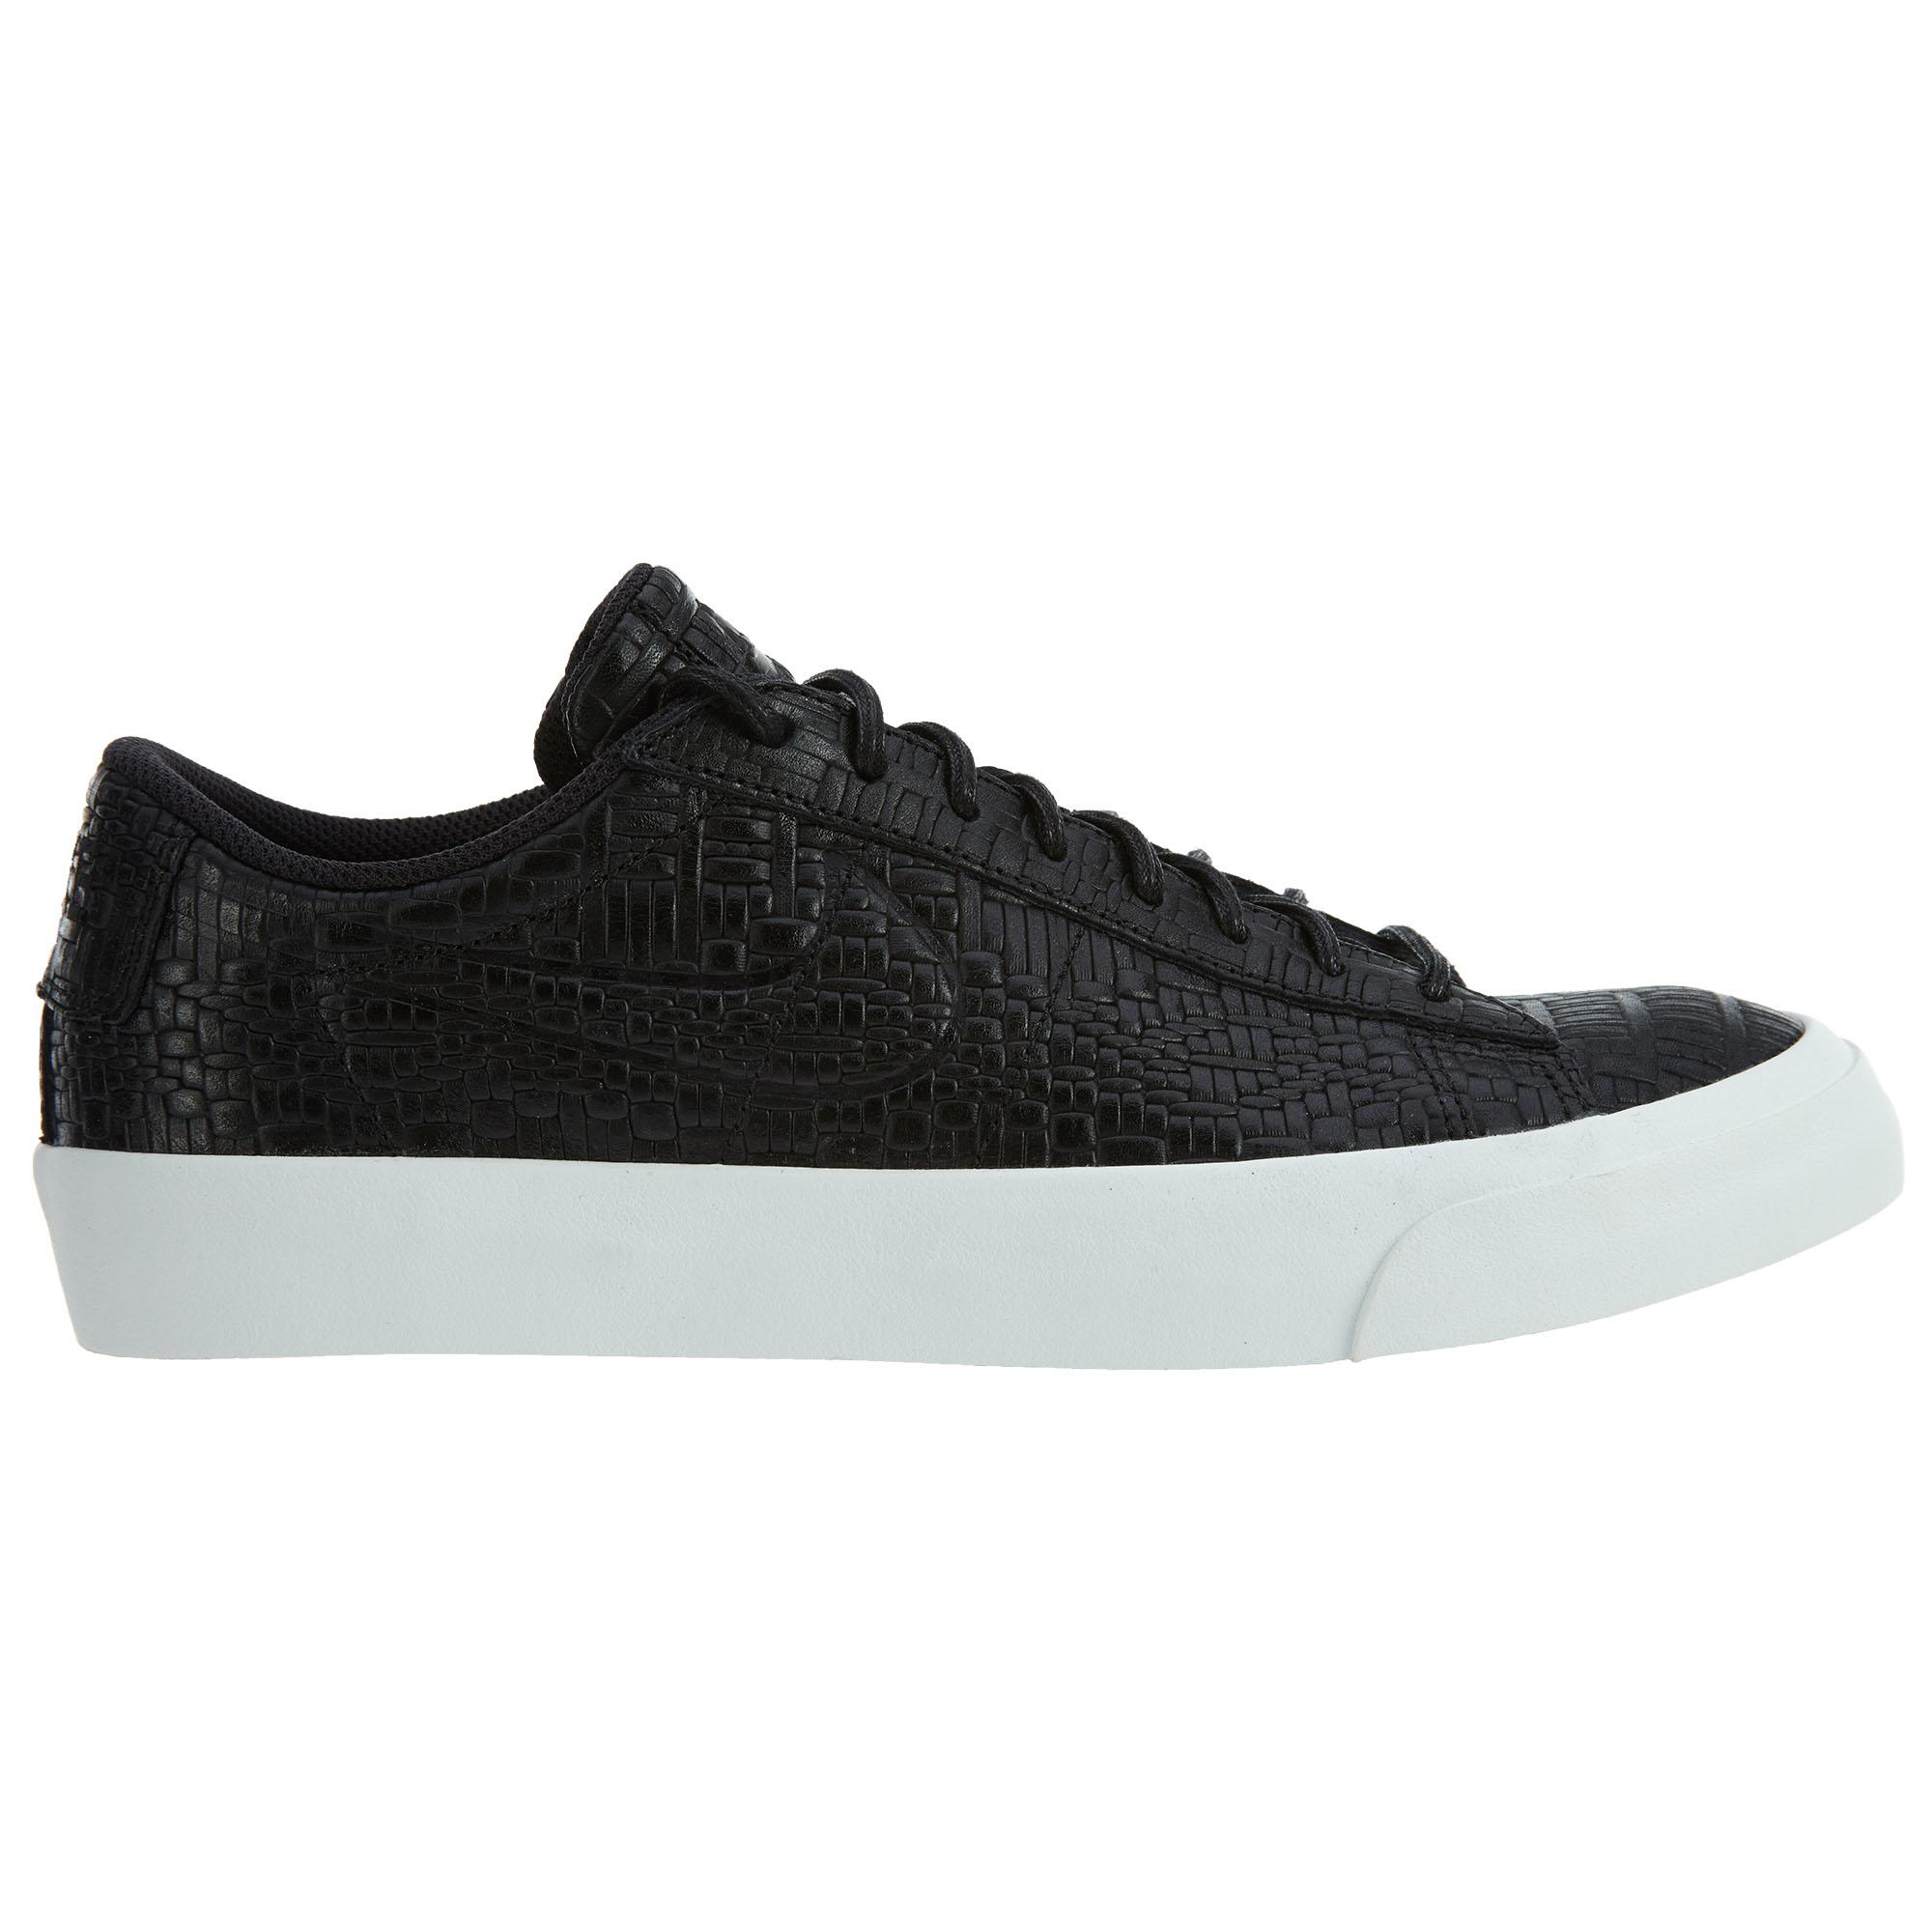 Nike Blazer Studio Low Black/Black/Summit White